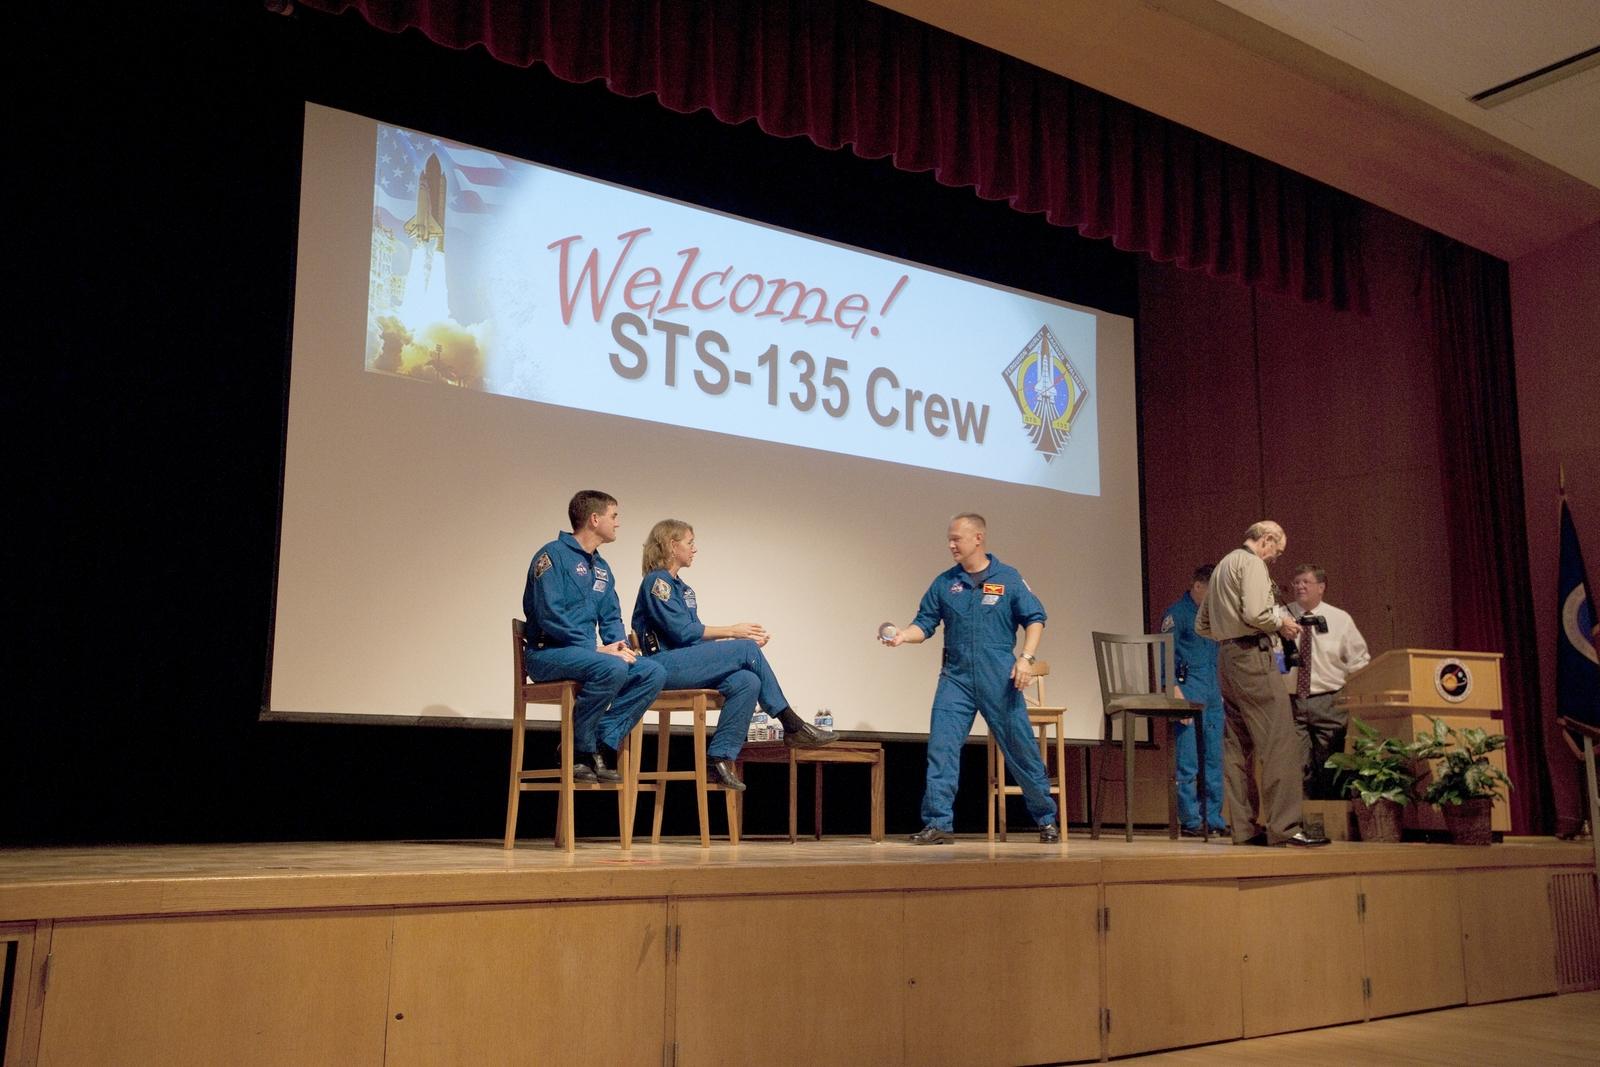 SPACE SHUTTLE STS-135 CREW VISIT GODDARD SPACE FLIGHT CENTER